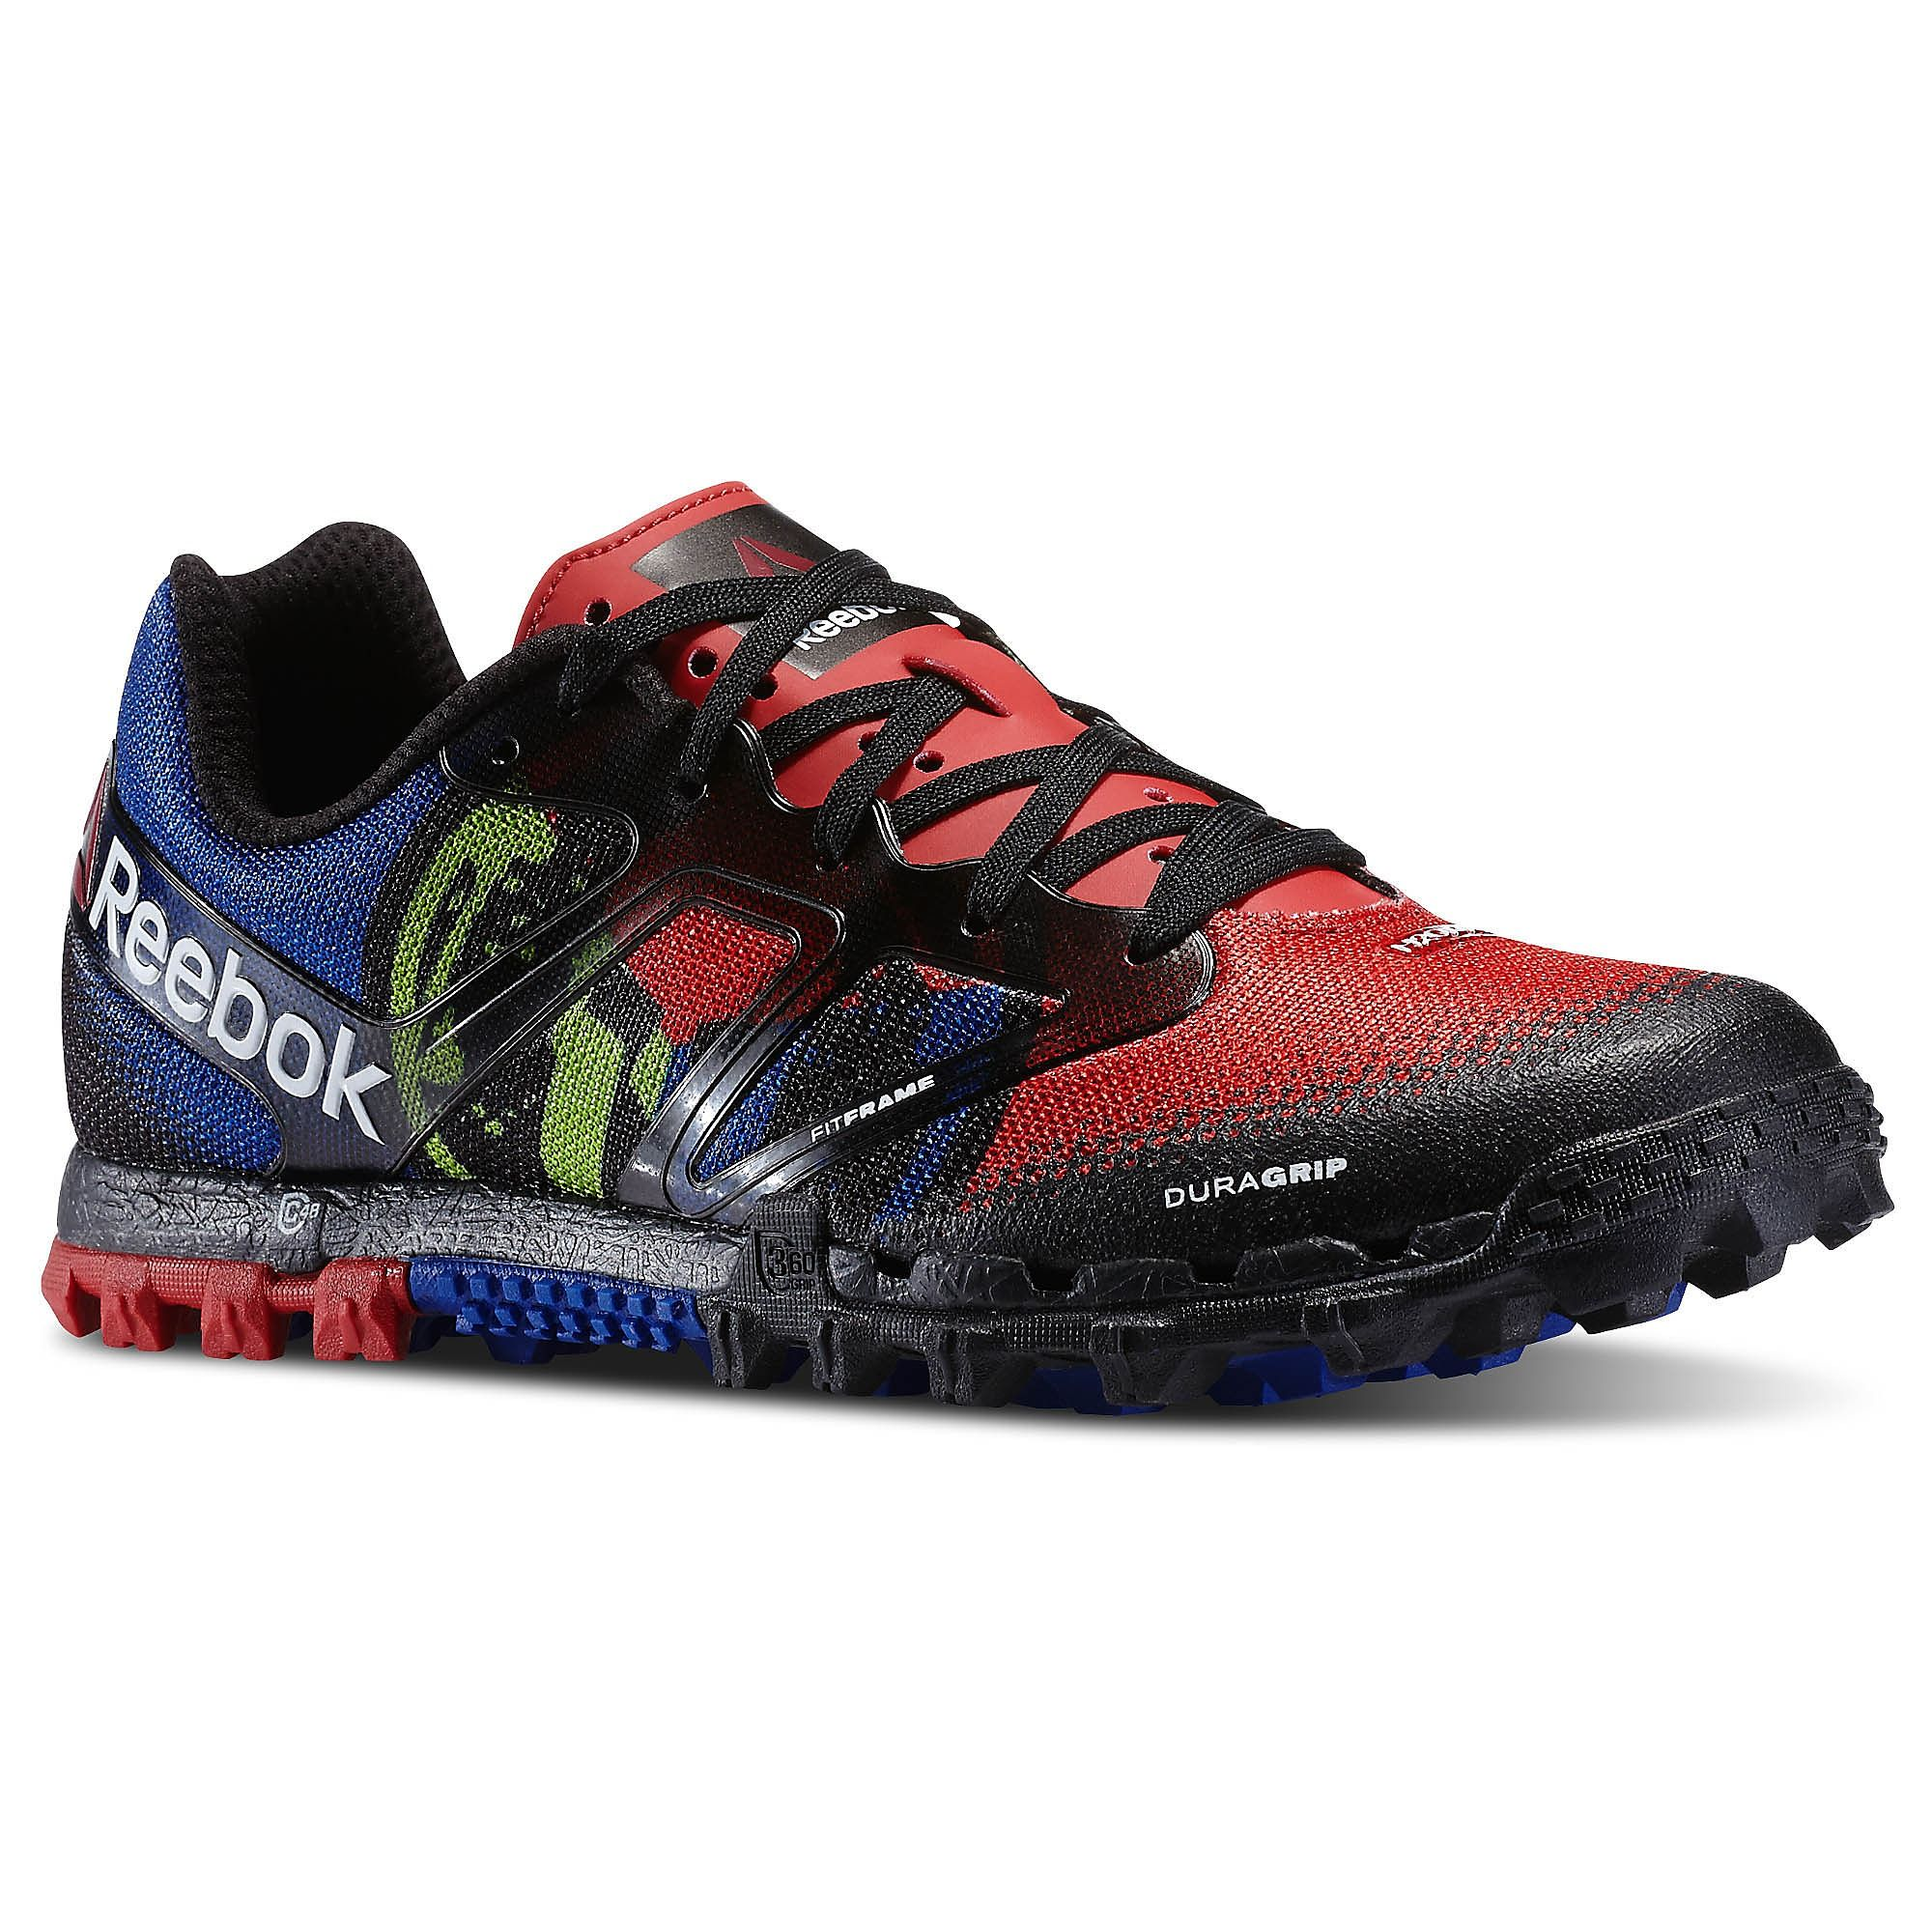 chaussure reebok spartan race hommes rouge